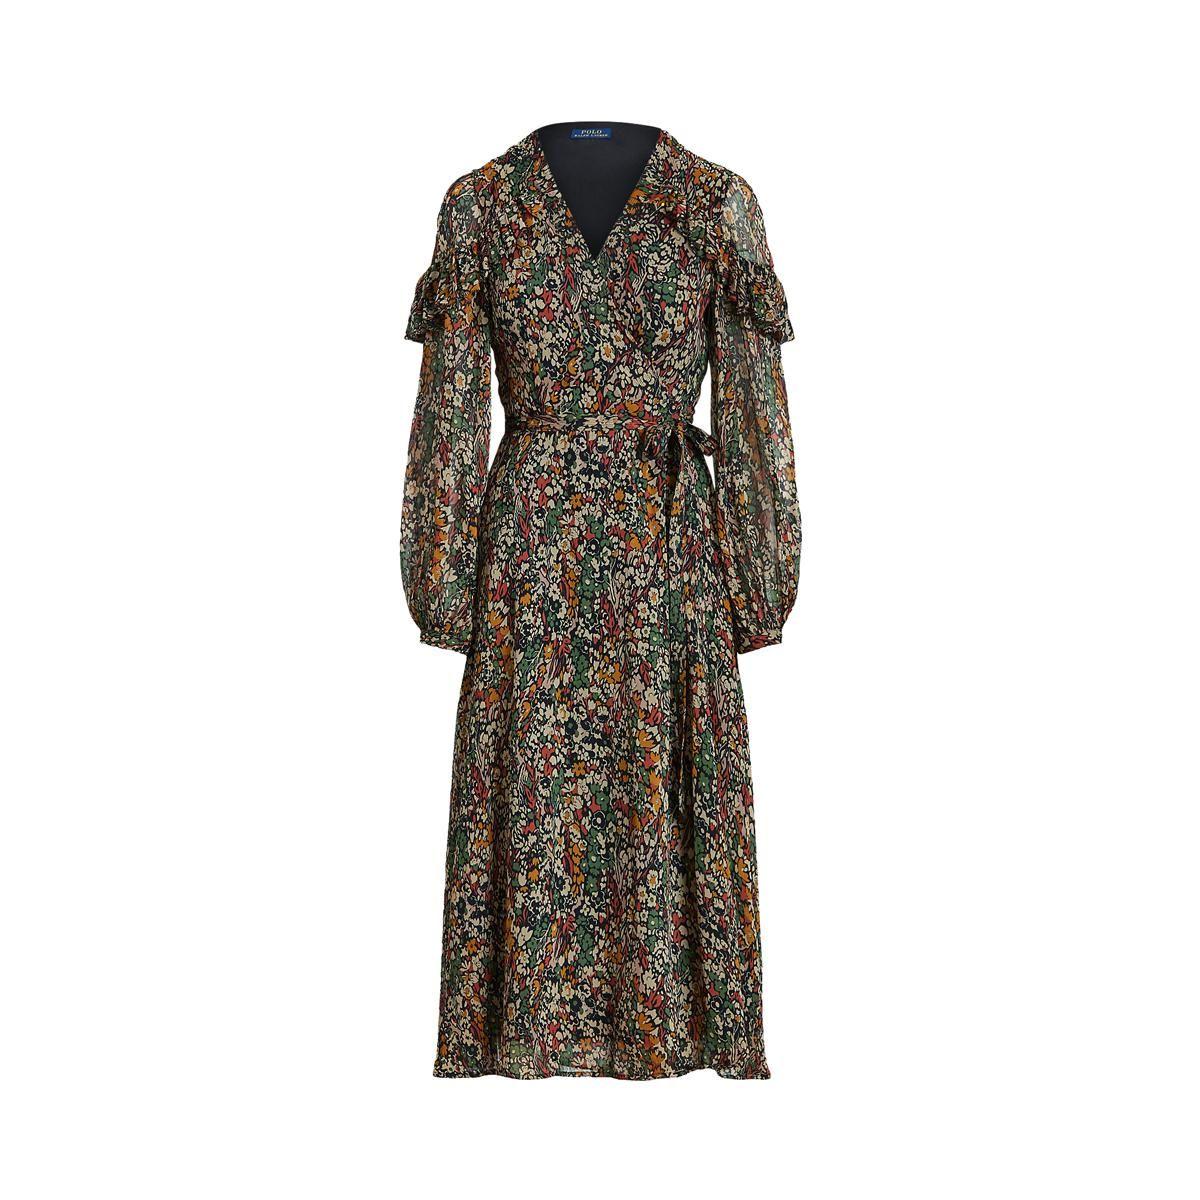 polo ralph lauren junia crinkled floral wrap dress